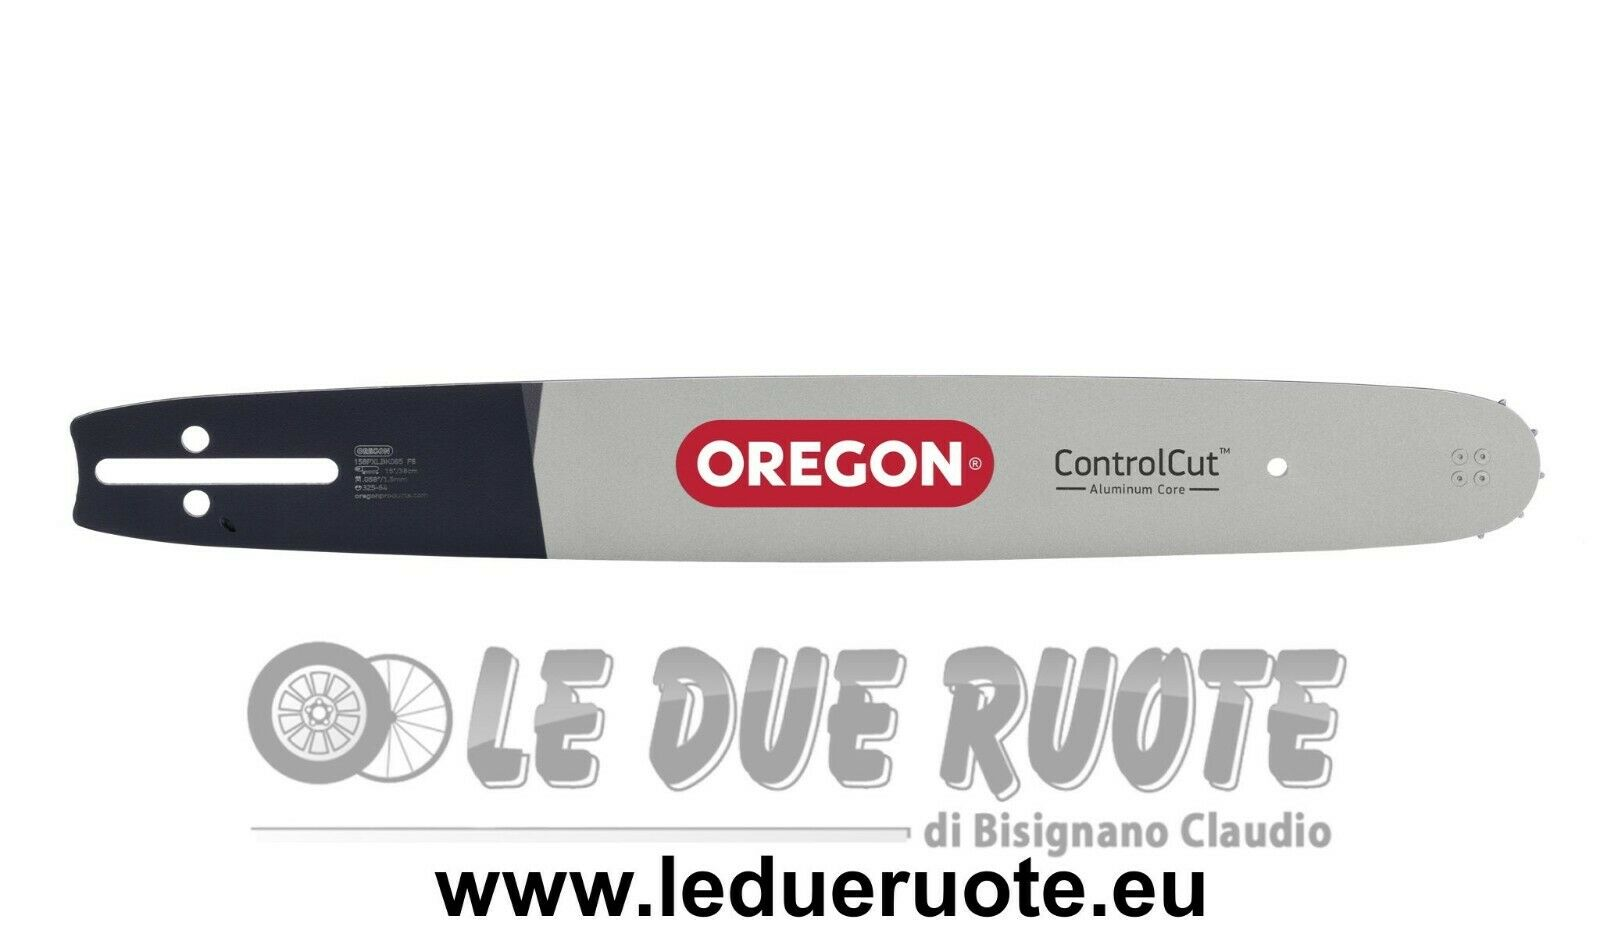 Barra Oregon Motosierra Stihl MS362 E220 MS361 Control Cut™ 38 40 cm Original